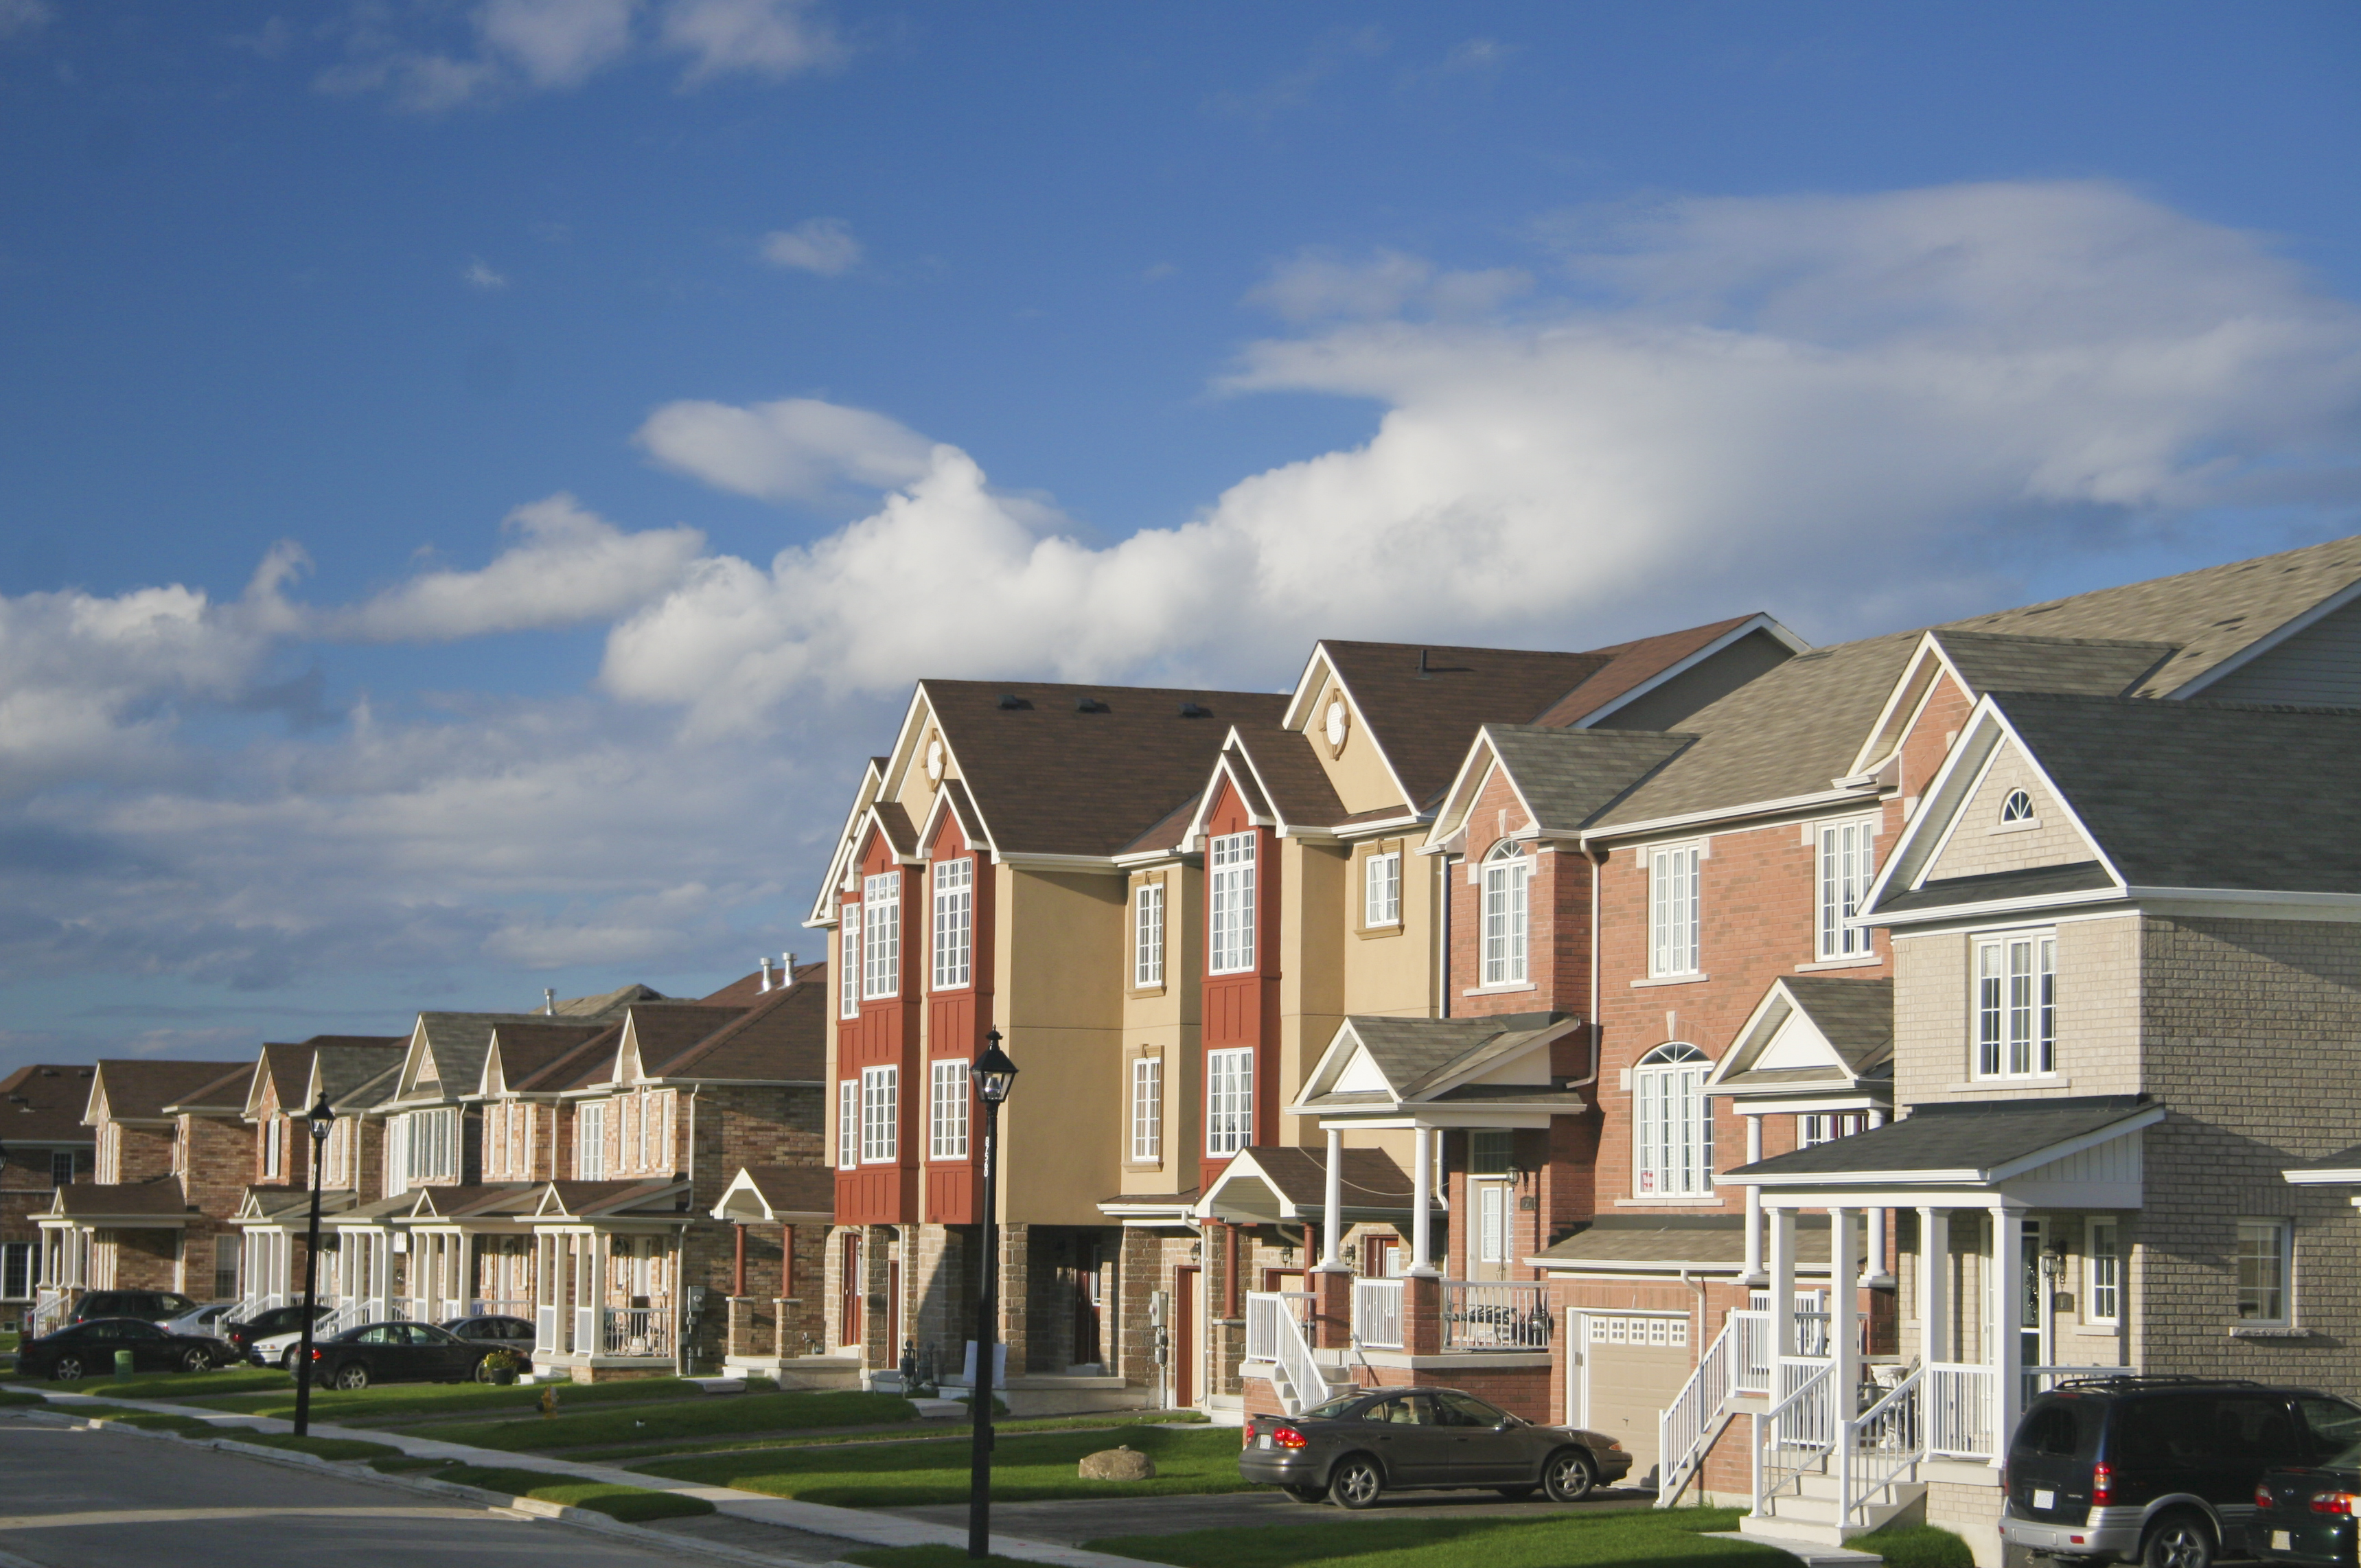 renters-insurance | JD Fulwiler & Co. Insurance